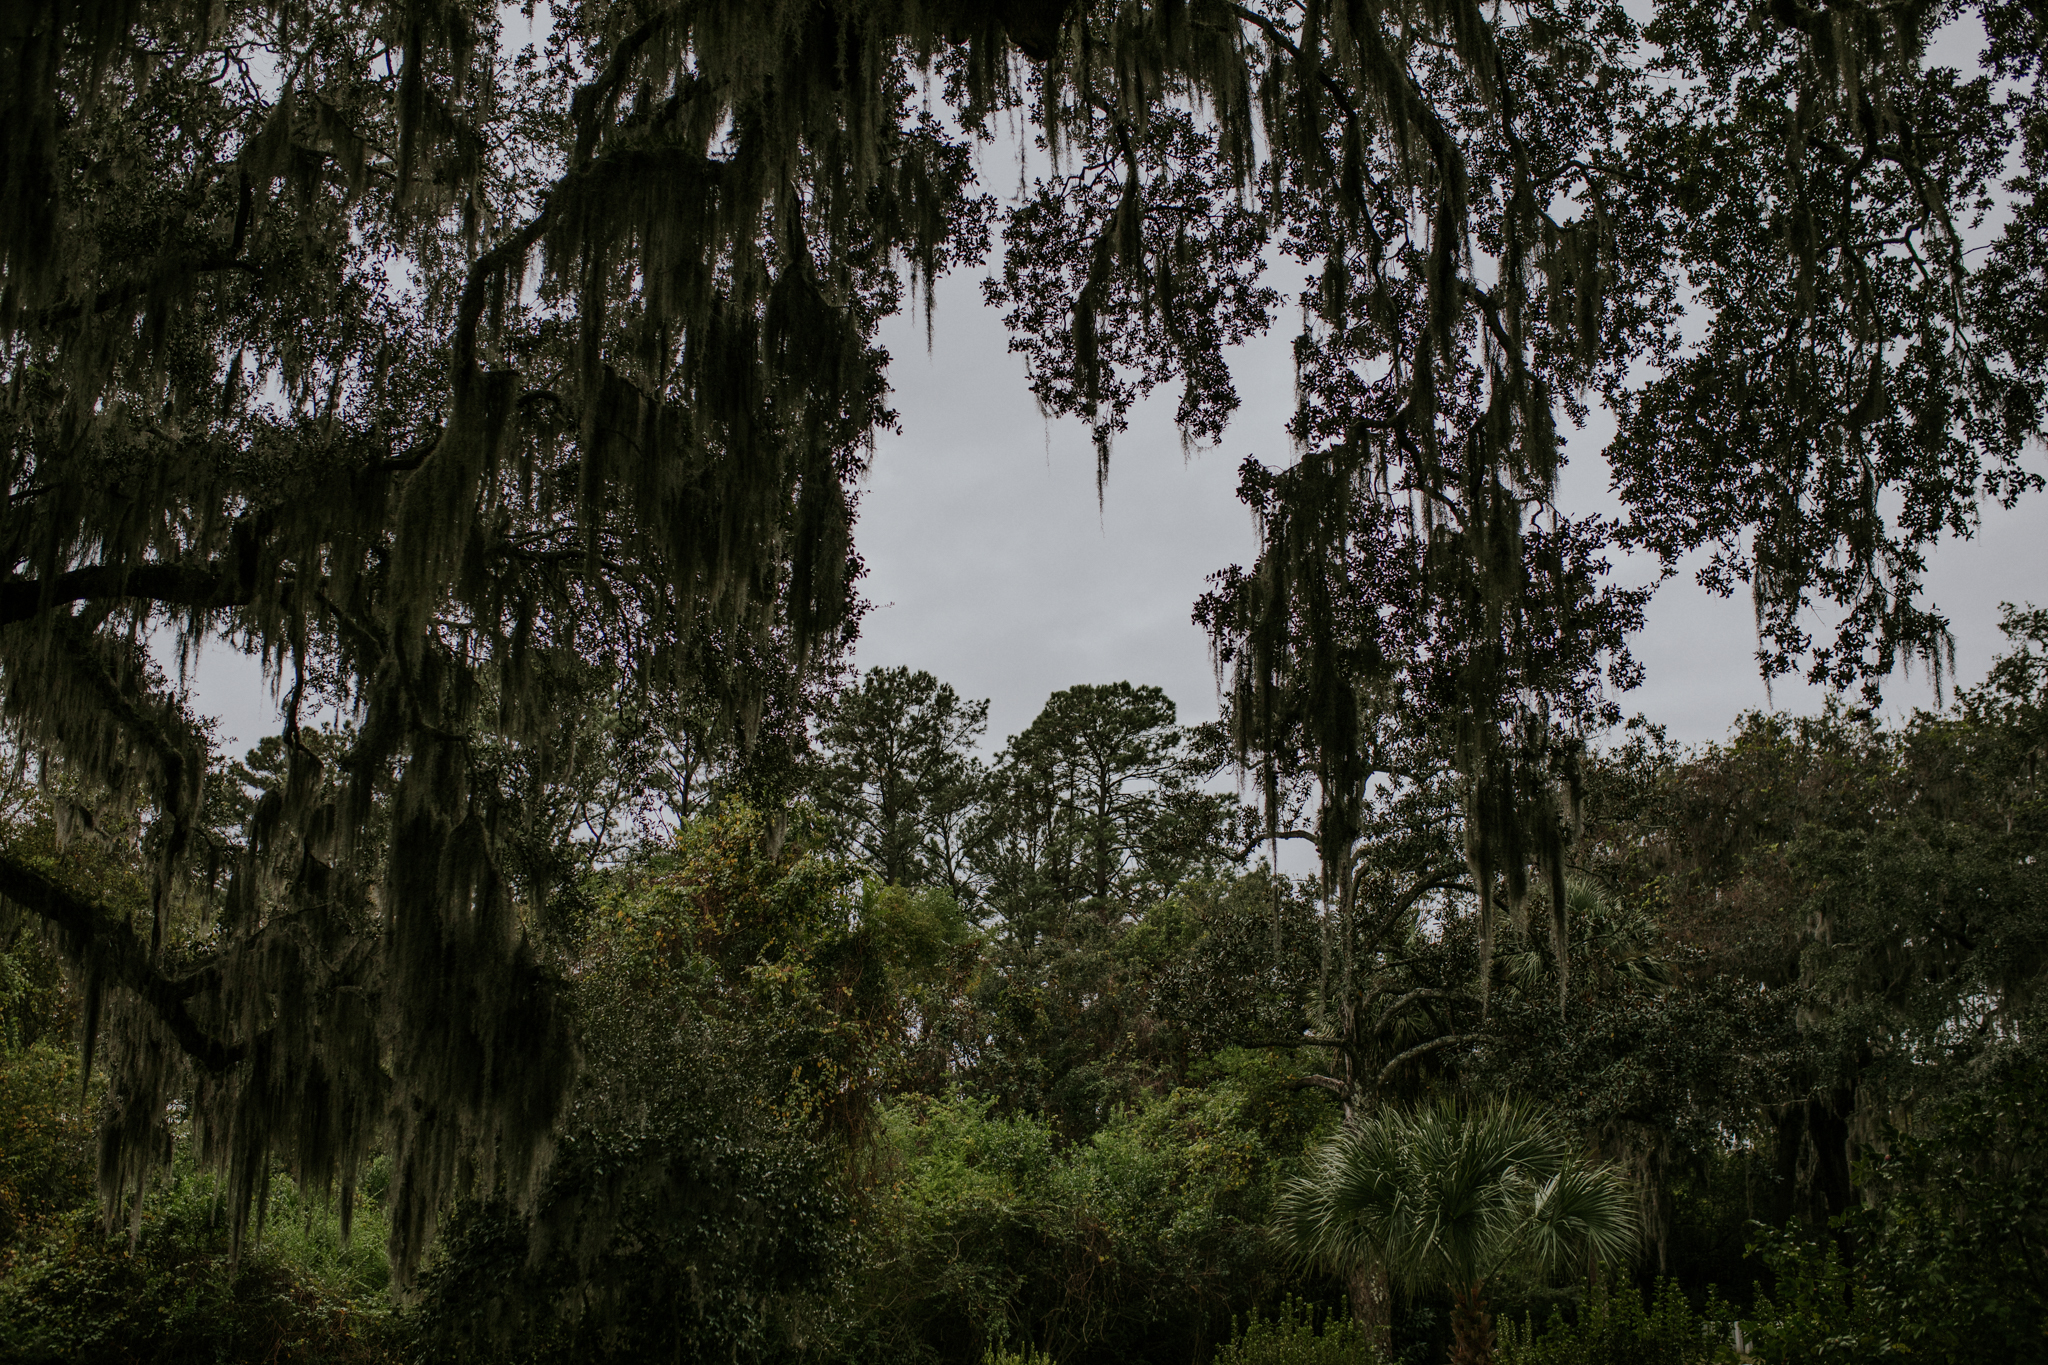 Bonaventure Cemetery - Savannah Georgia Travel - Destination Elopement Photographer - Vow of the Wild